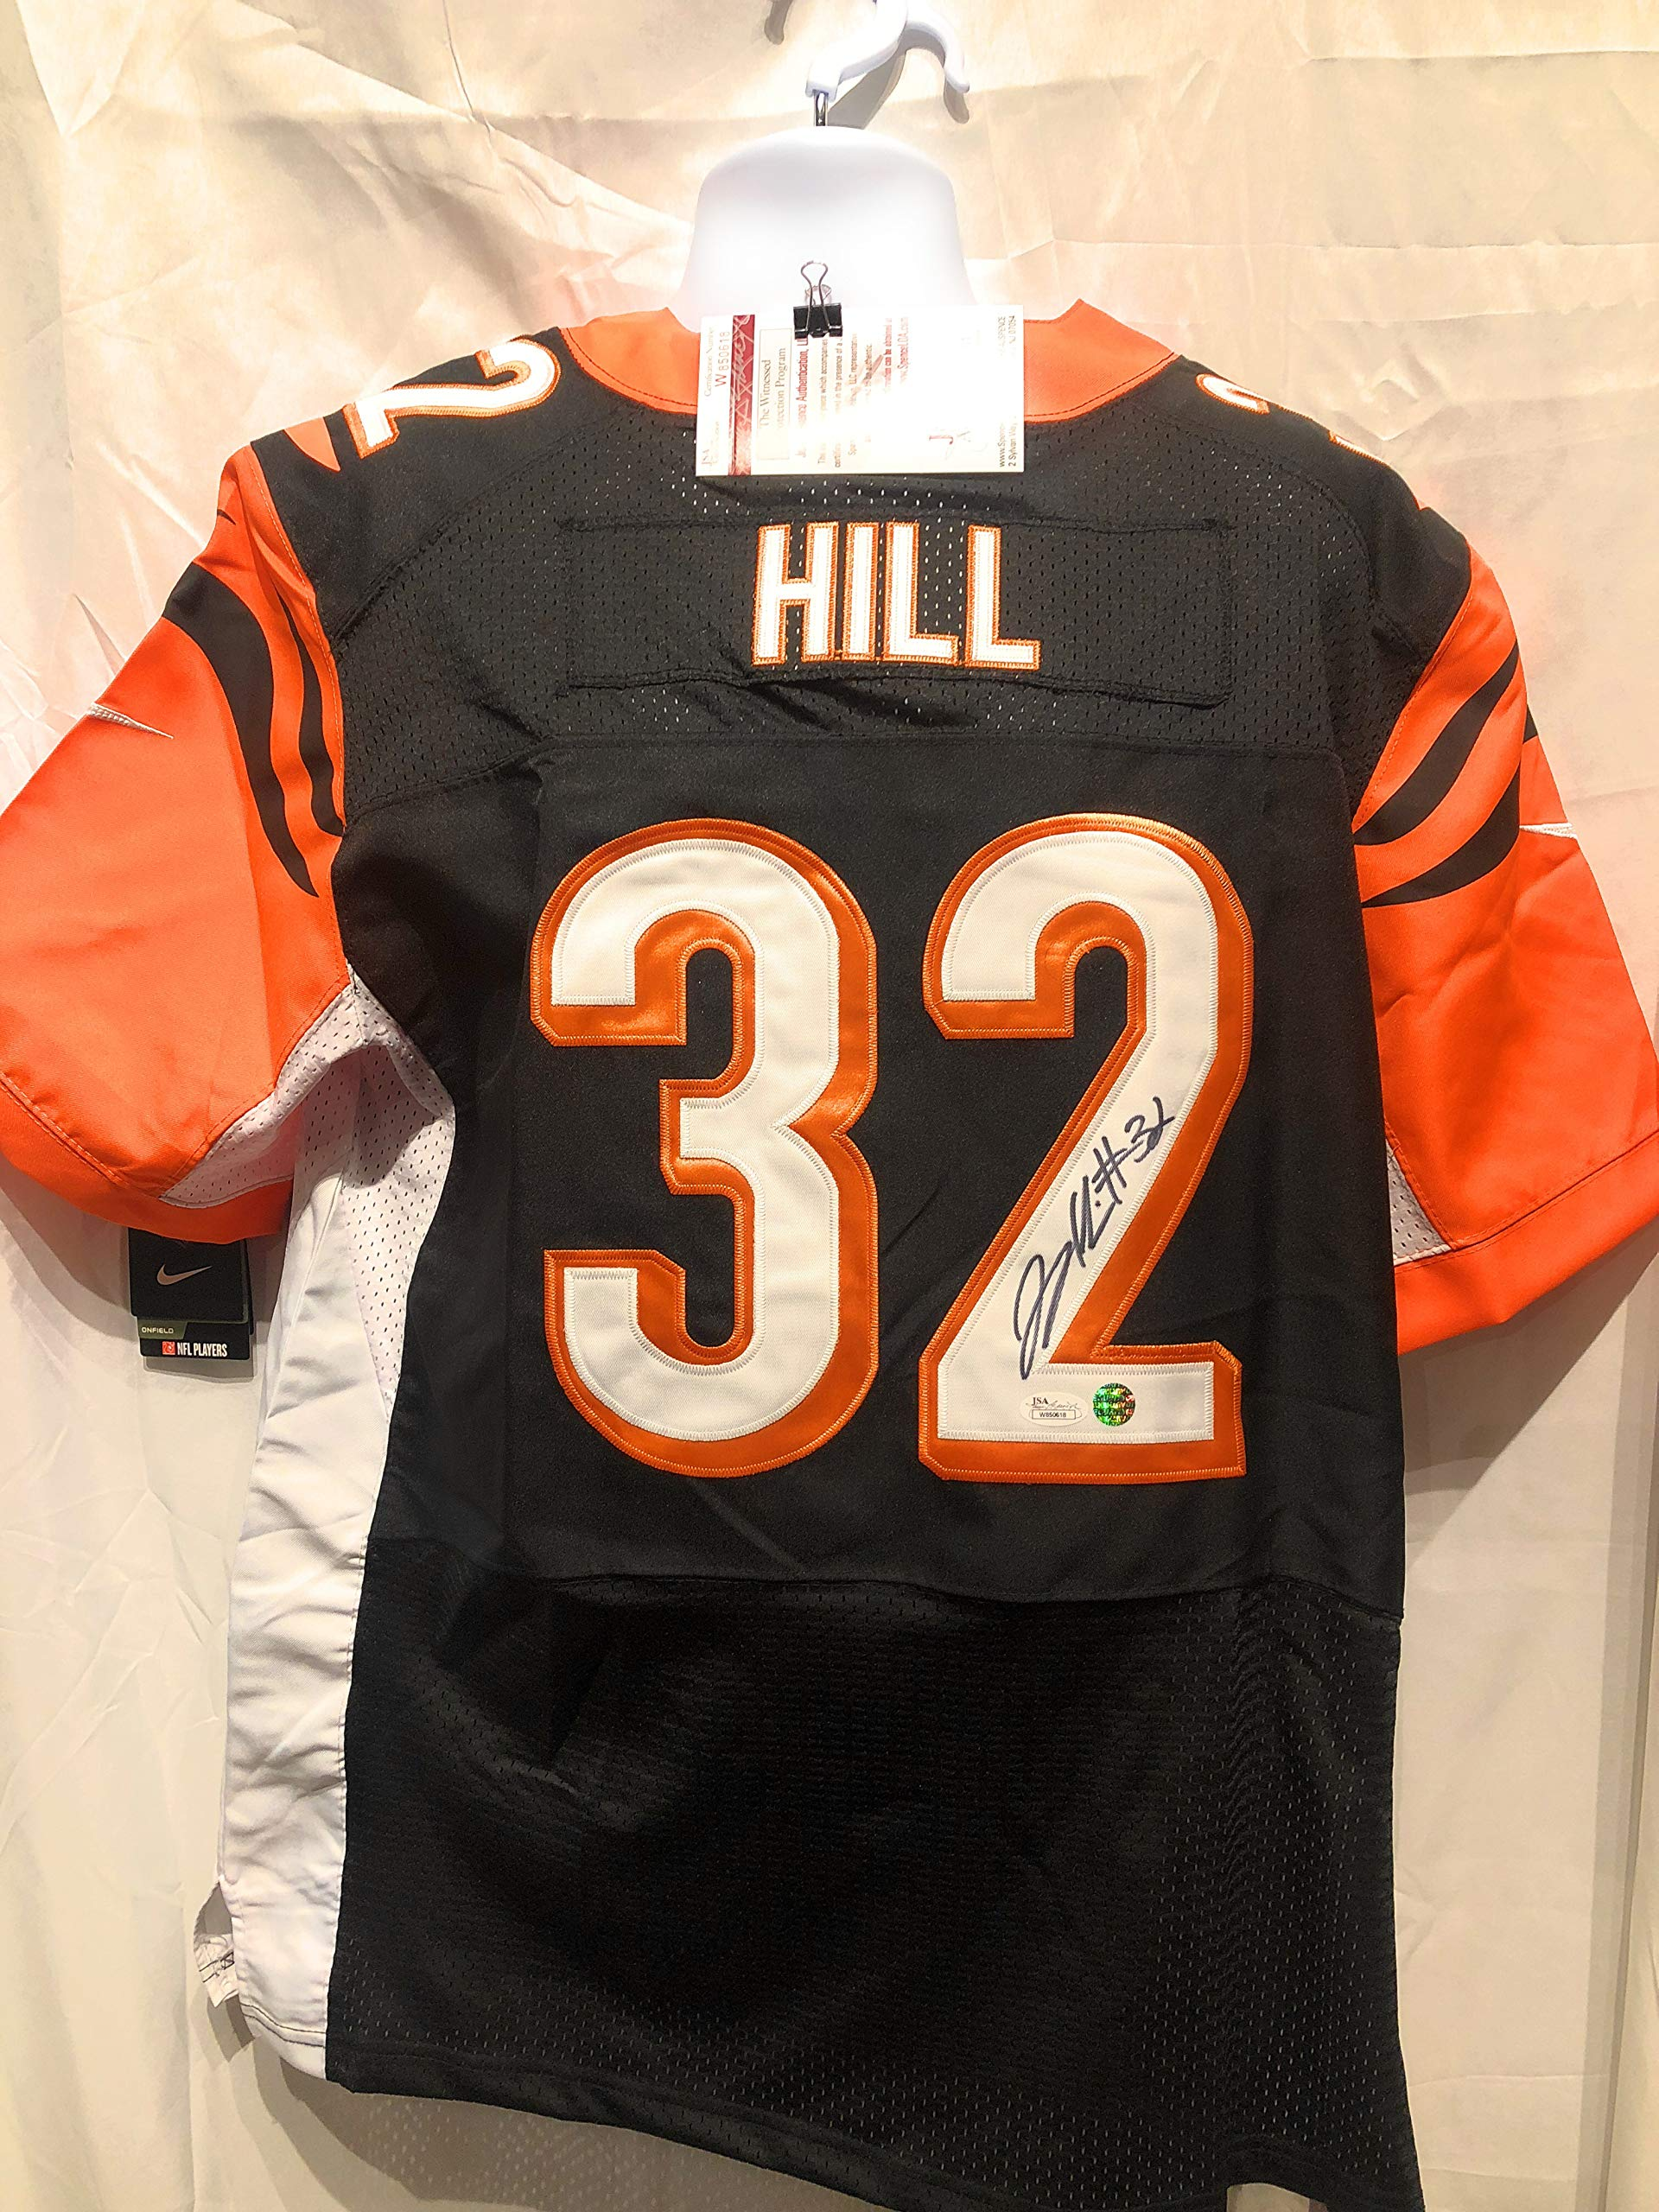 Jeremy Hill Cincinnati Bengals Signed Autograph Nike Jersey JSA Witnessed Certified